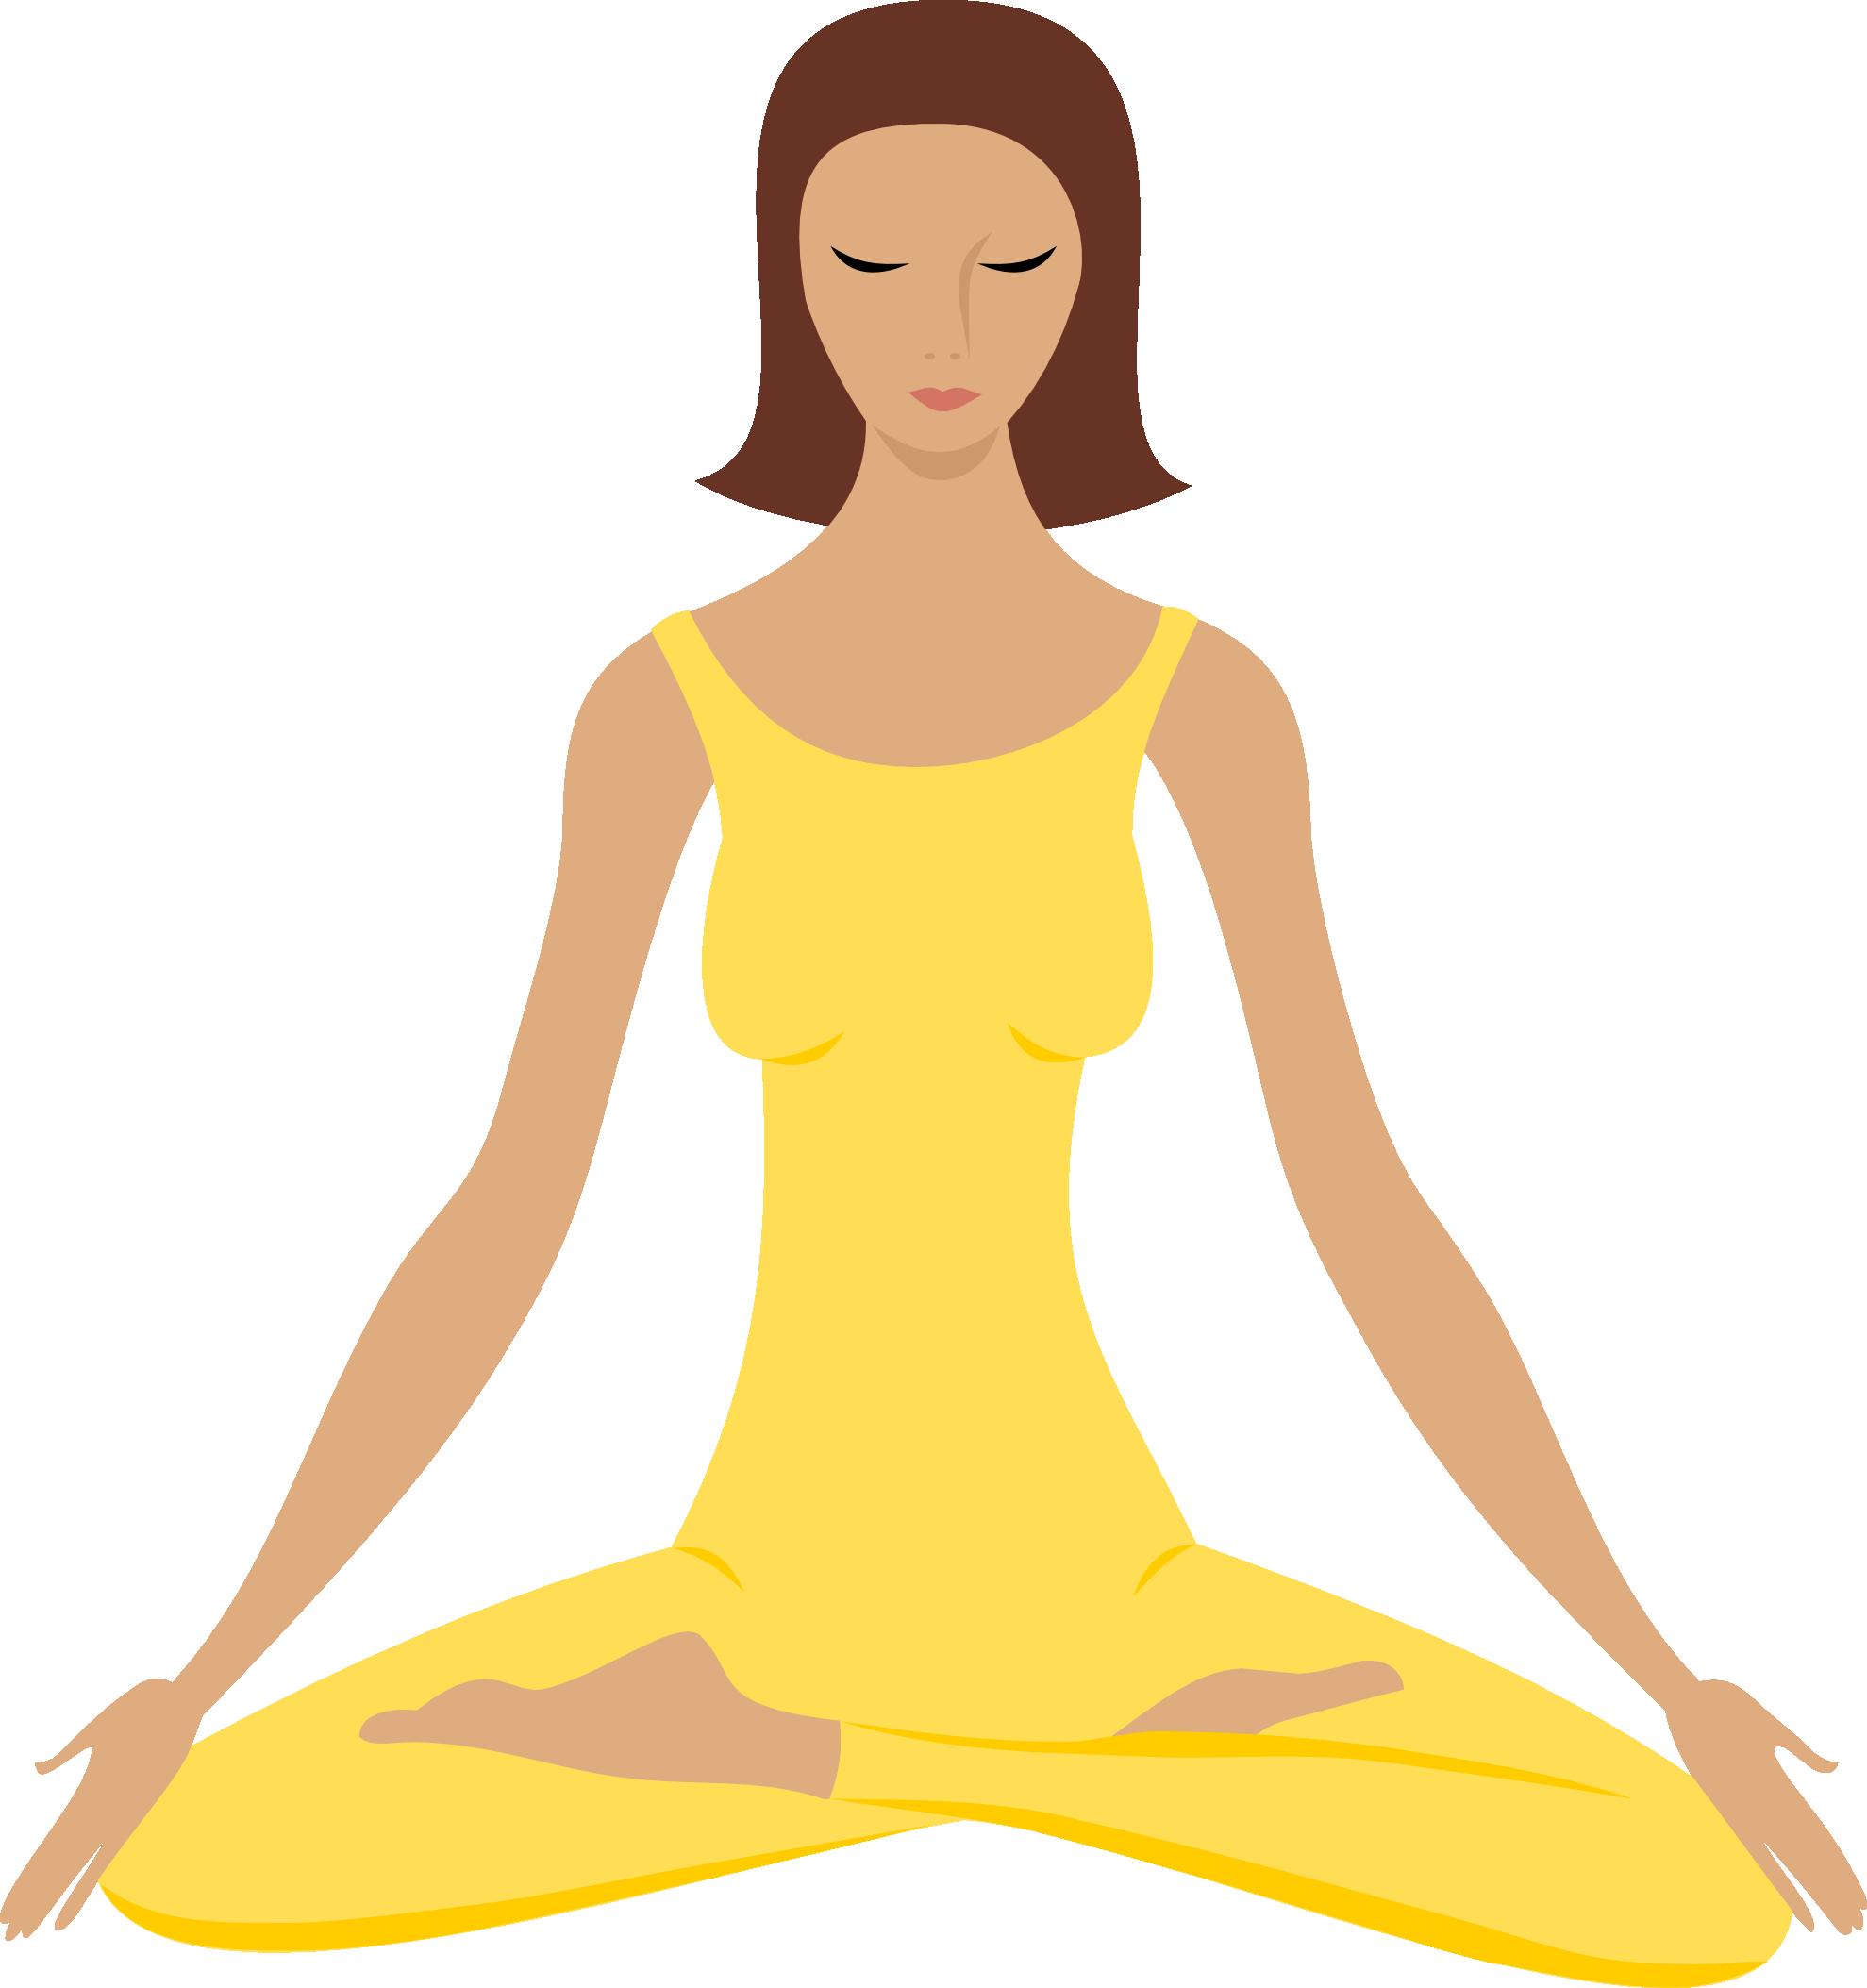 Clipart Info - Meditation, Transparent background PNG HD thumbnail